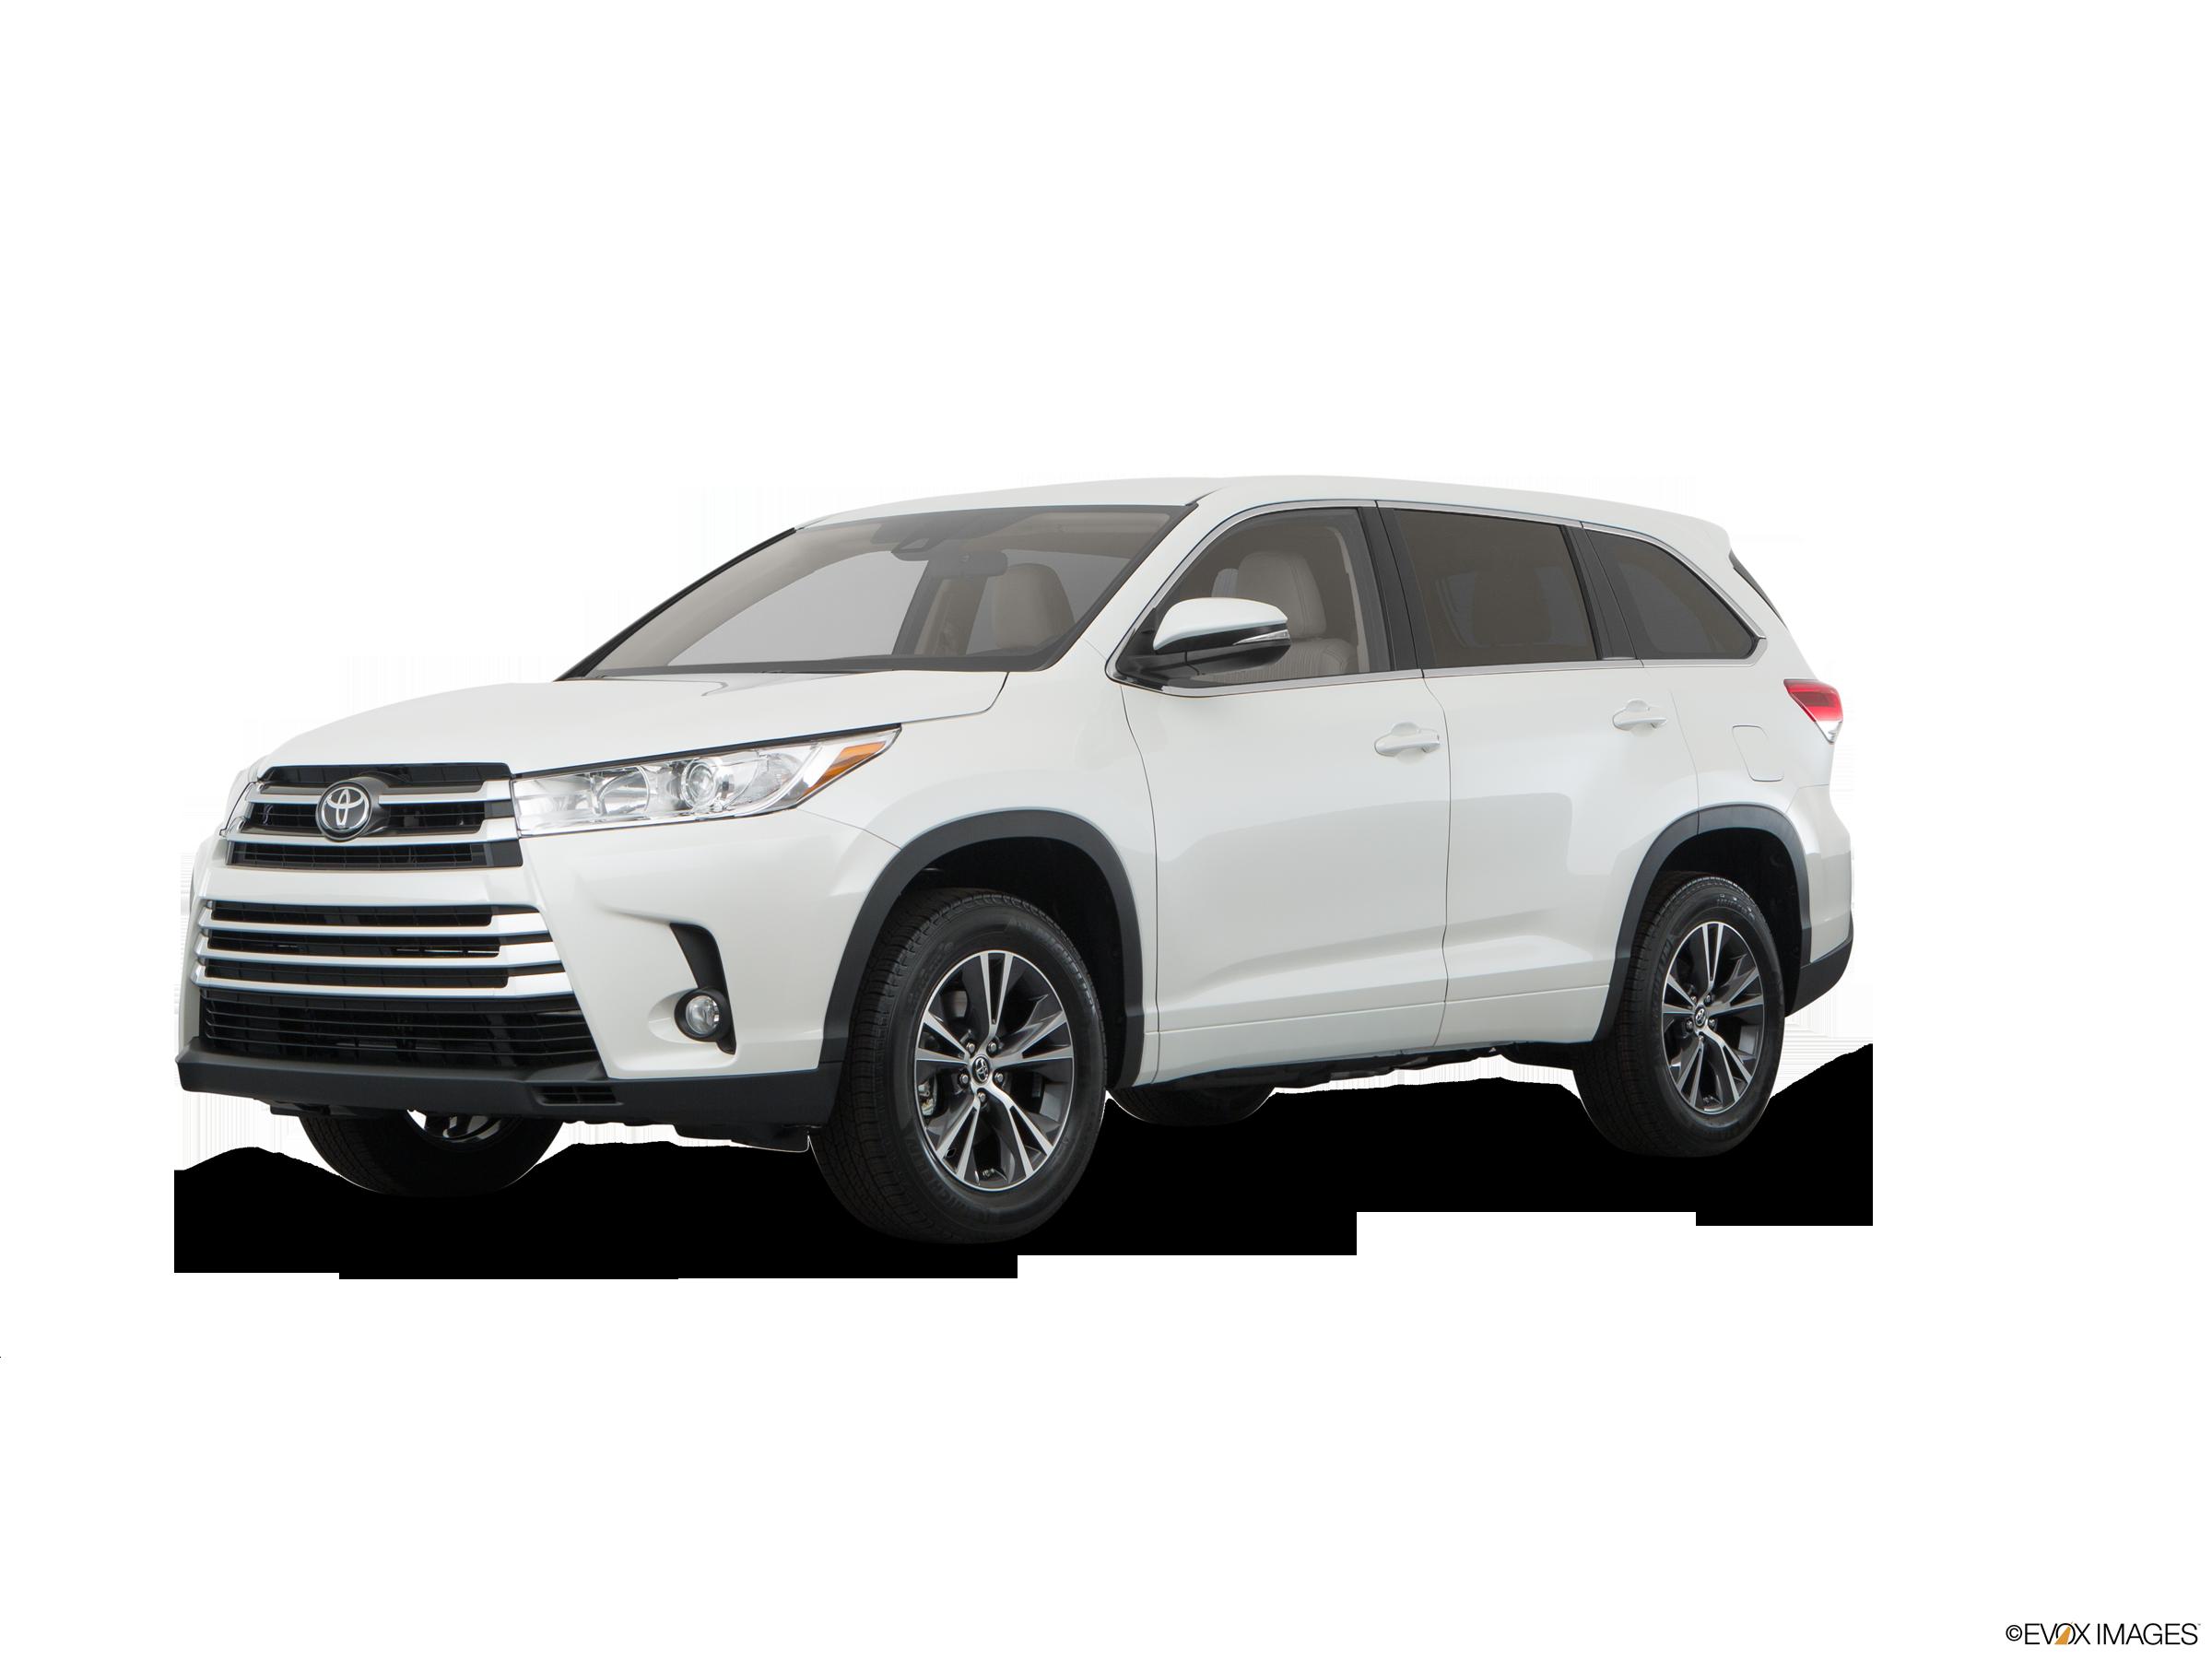 2019 Toyota Highlander Pricing Reviews Ratings Kelley